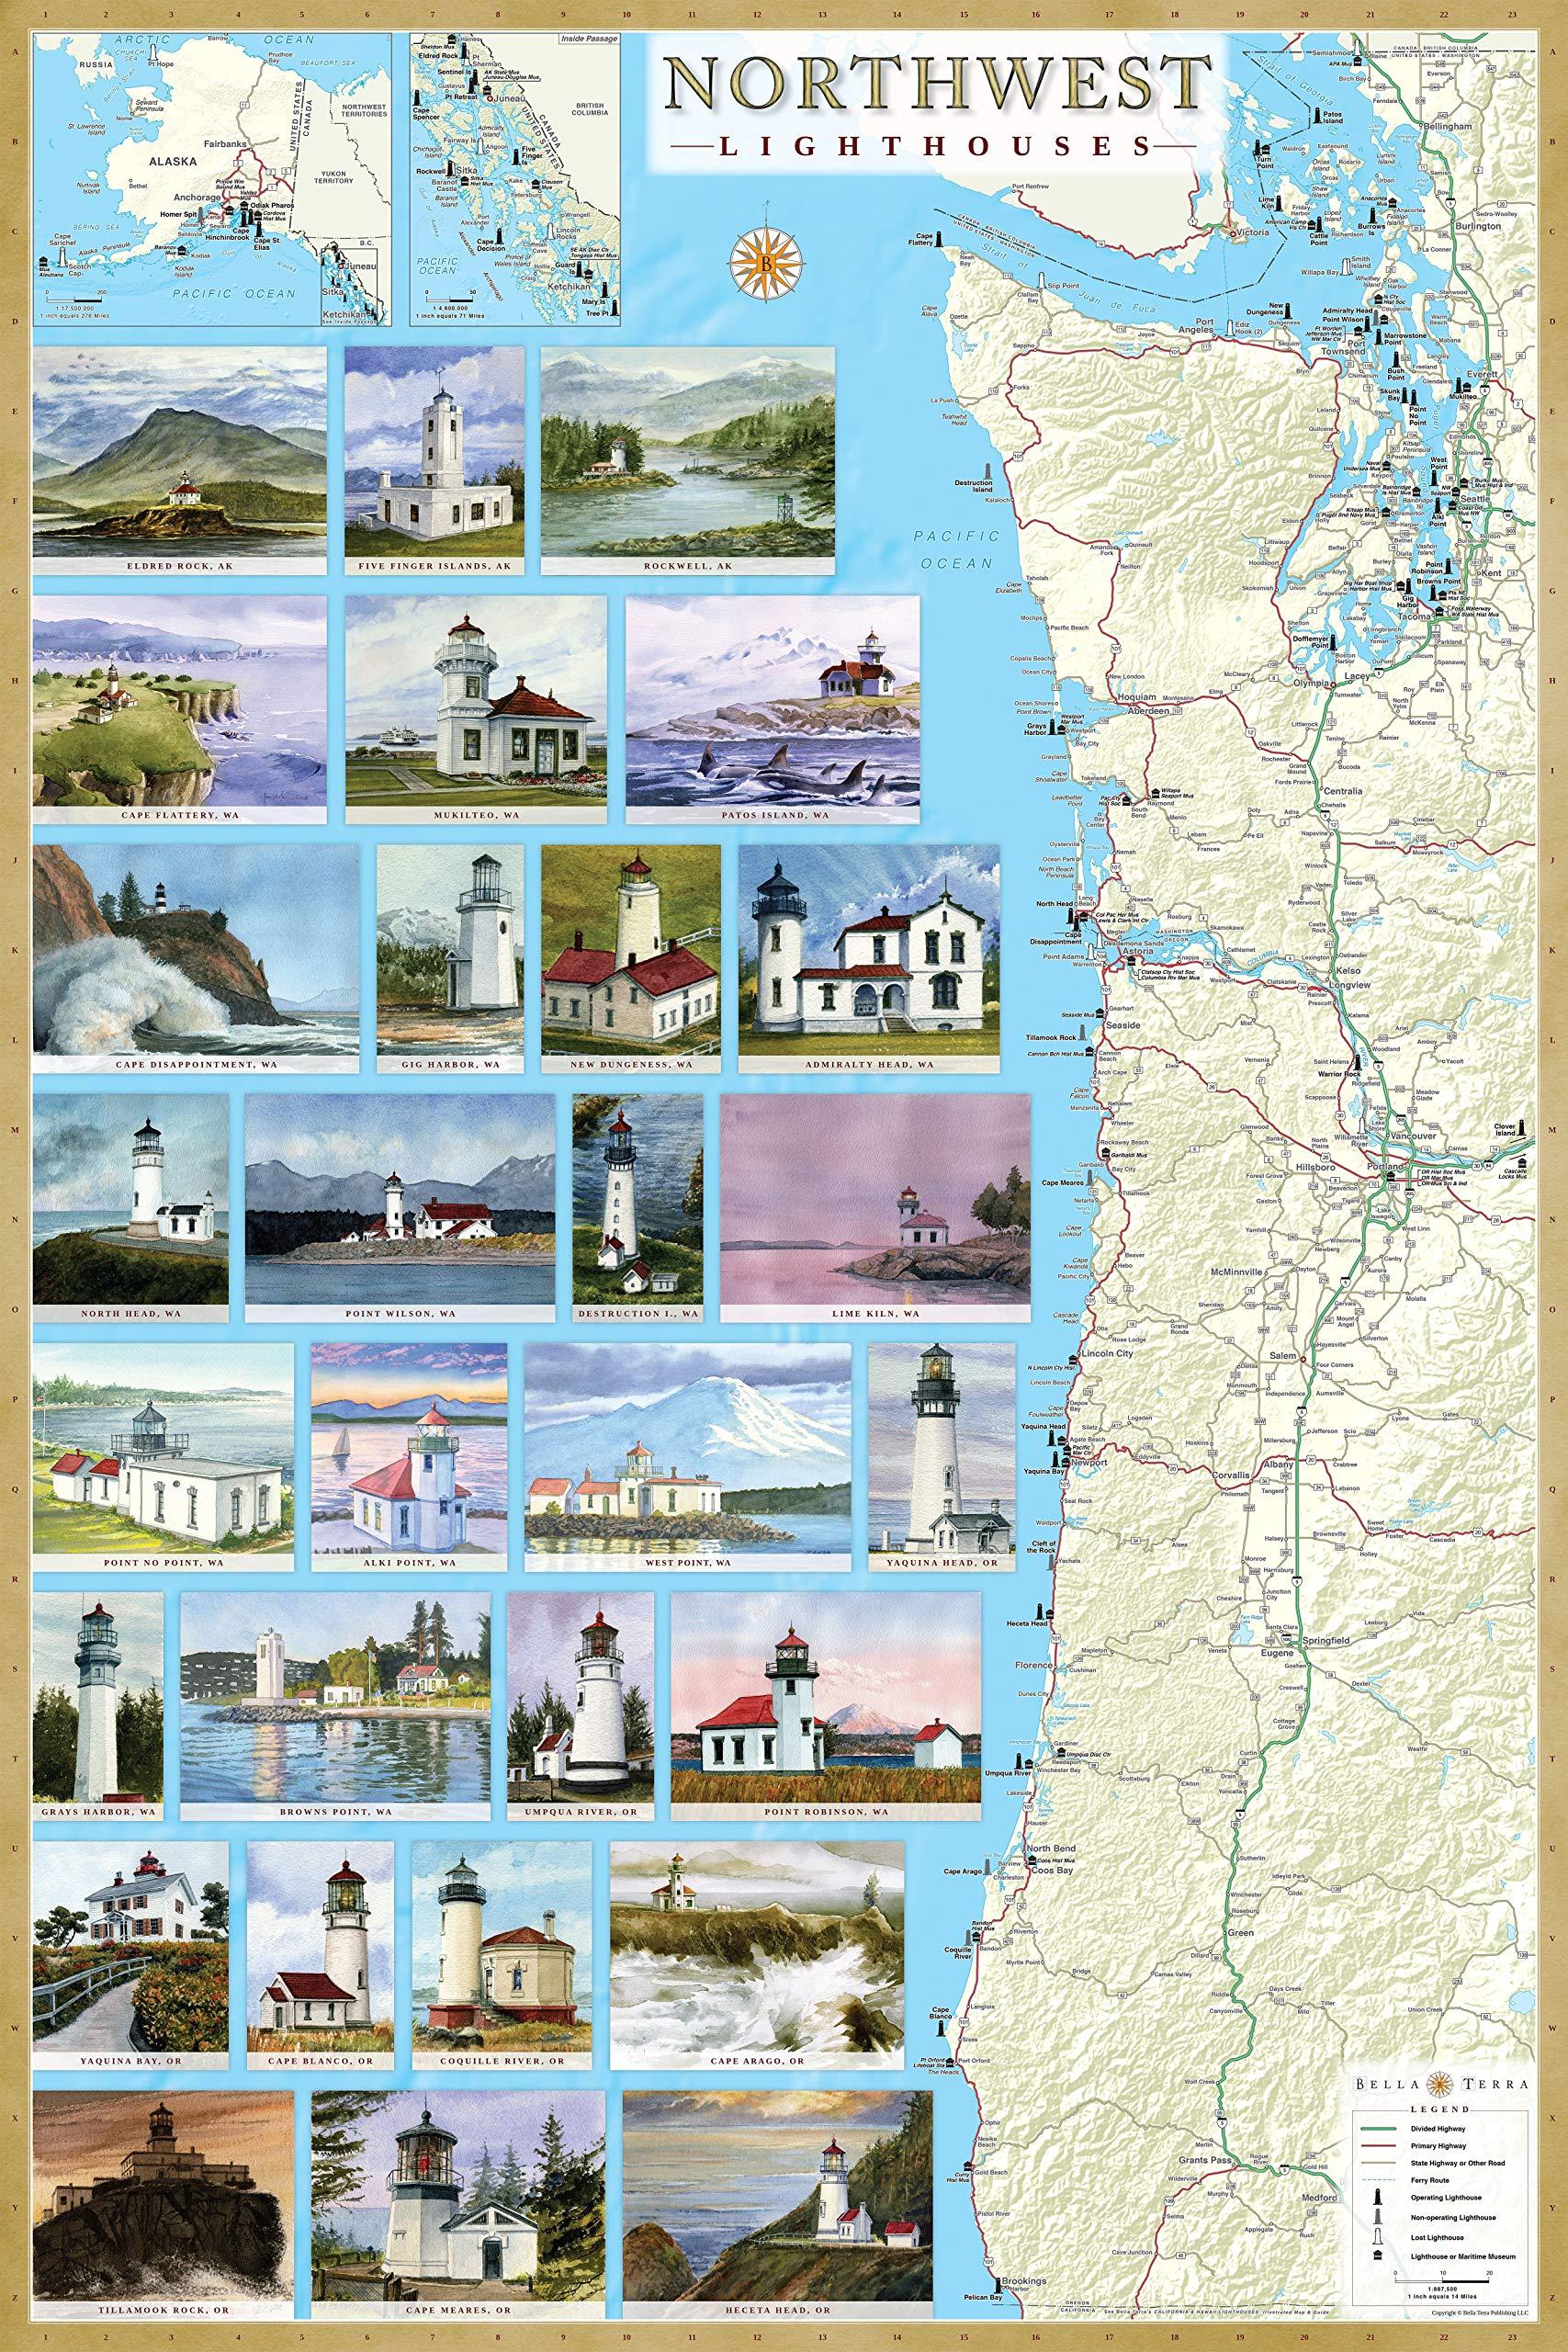 Map Of Alaska And Washington State.Northwest Lighthouses Illustrated Map Guide Laminated Poster